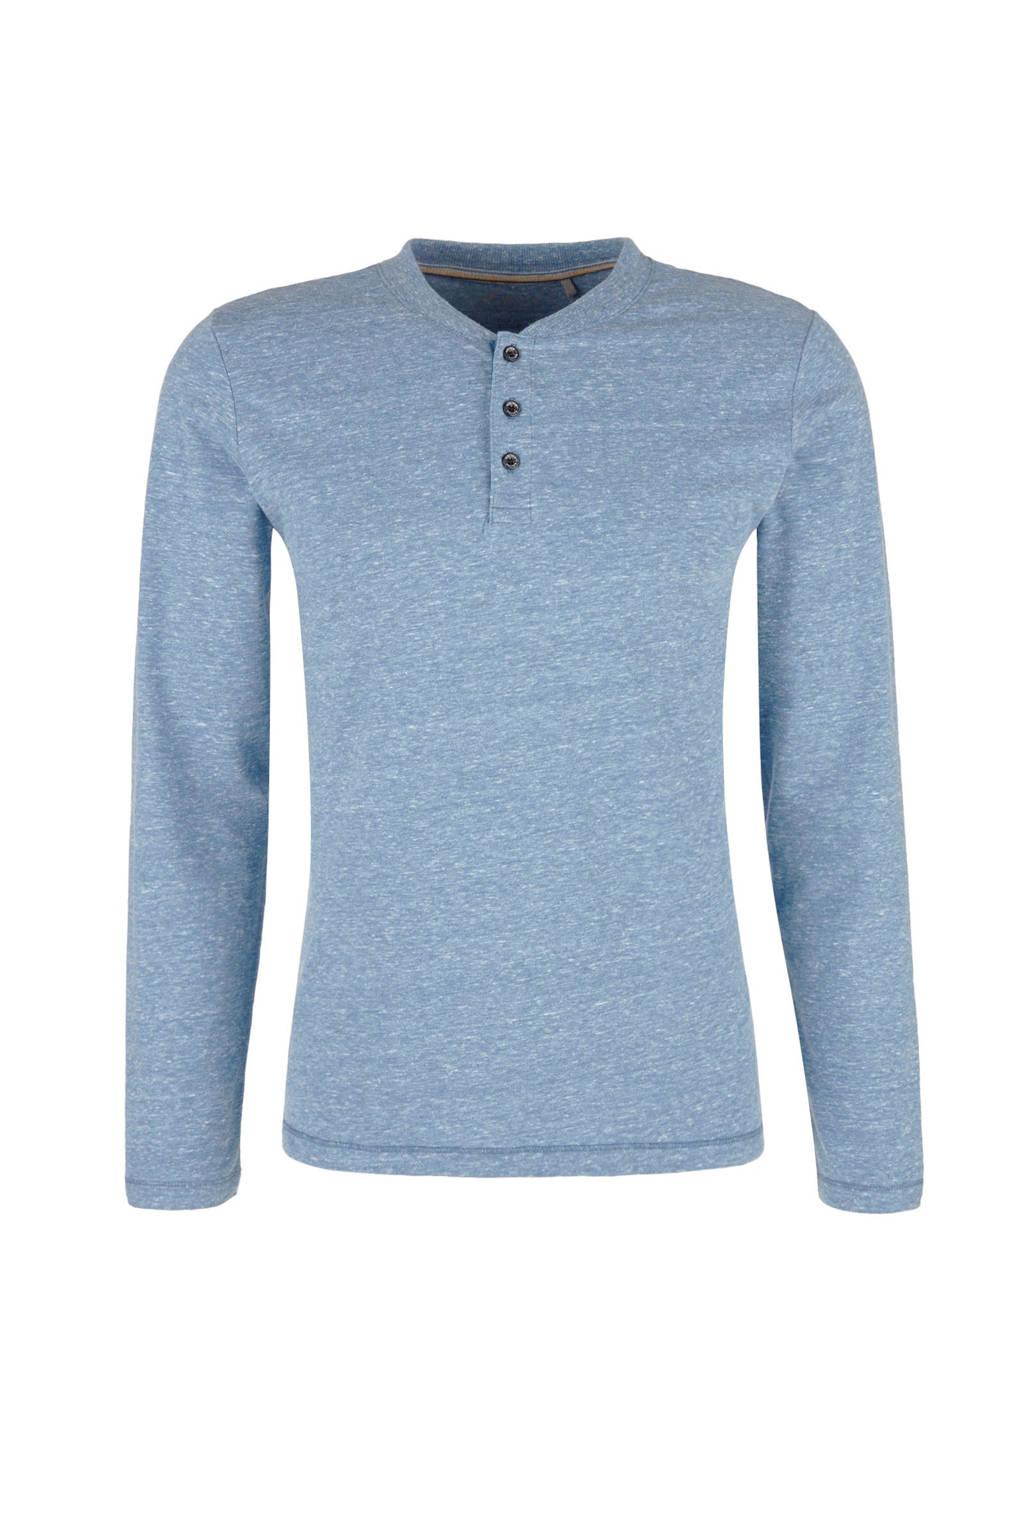 s.Oliver slim fit T-shirt, Blauw